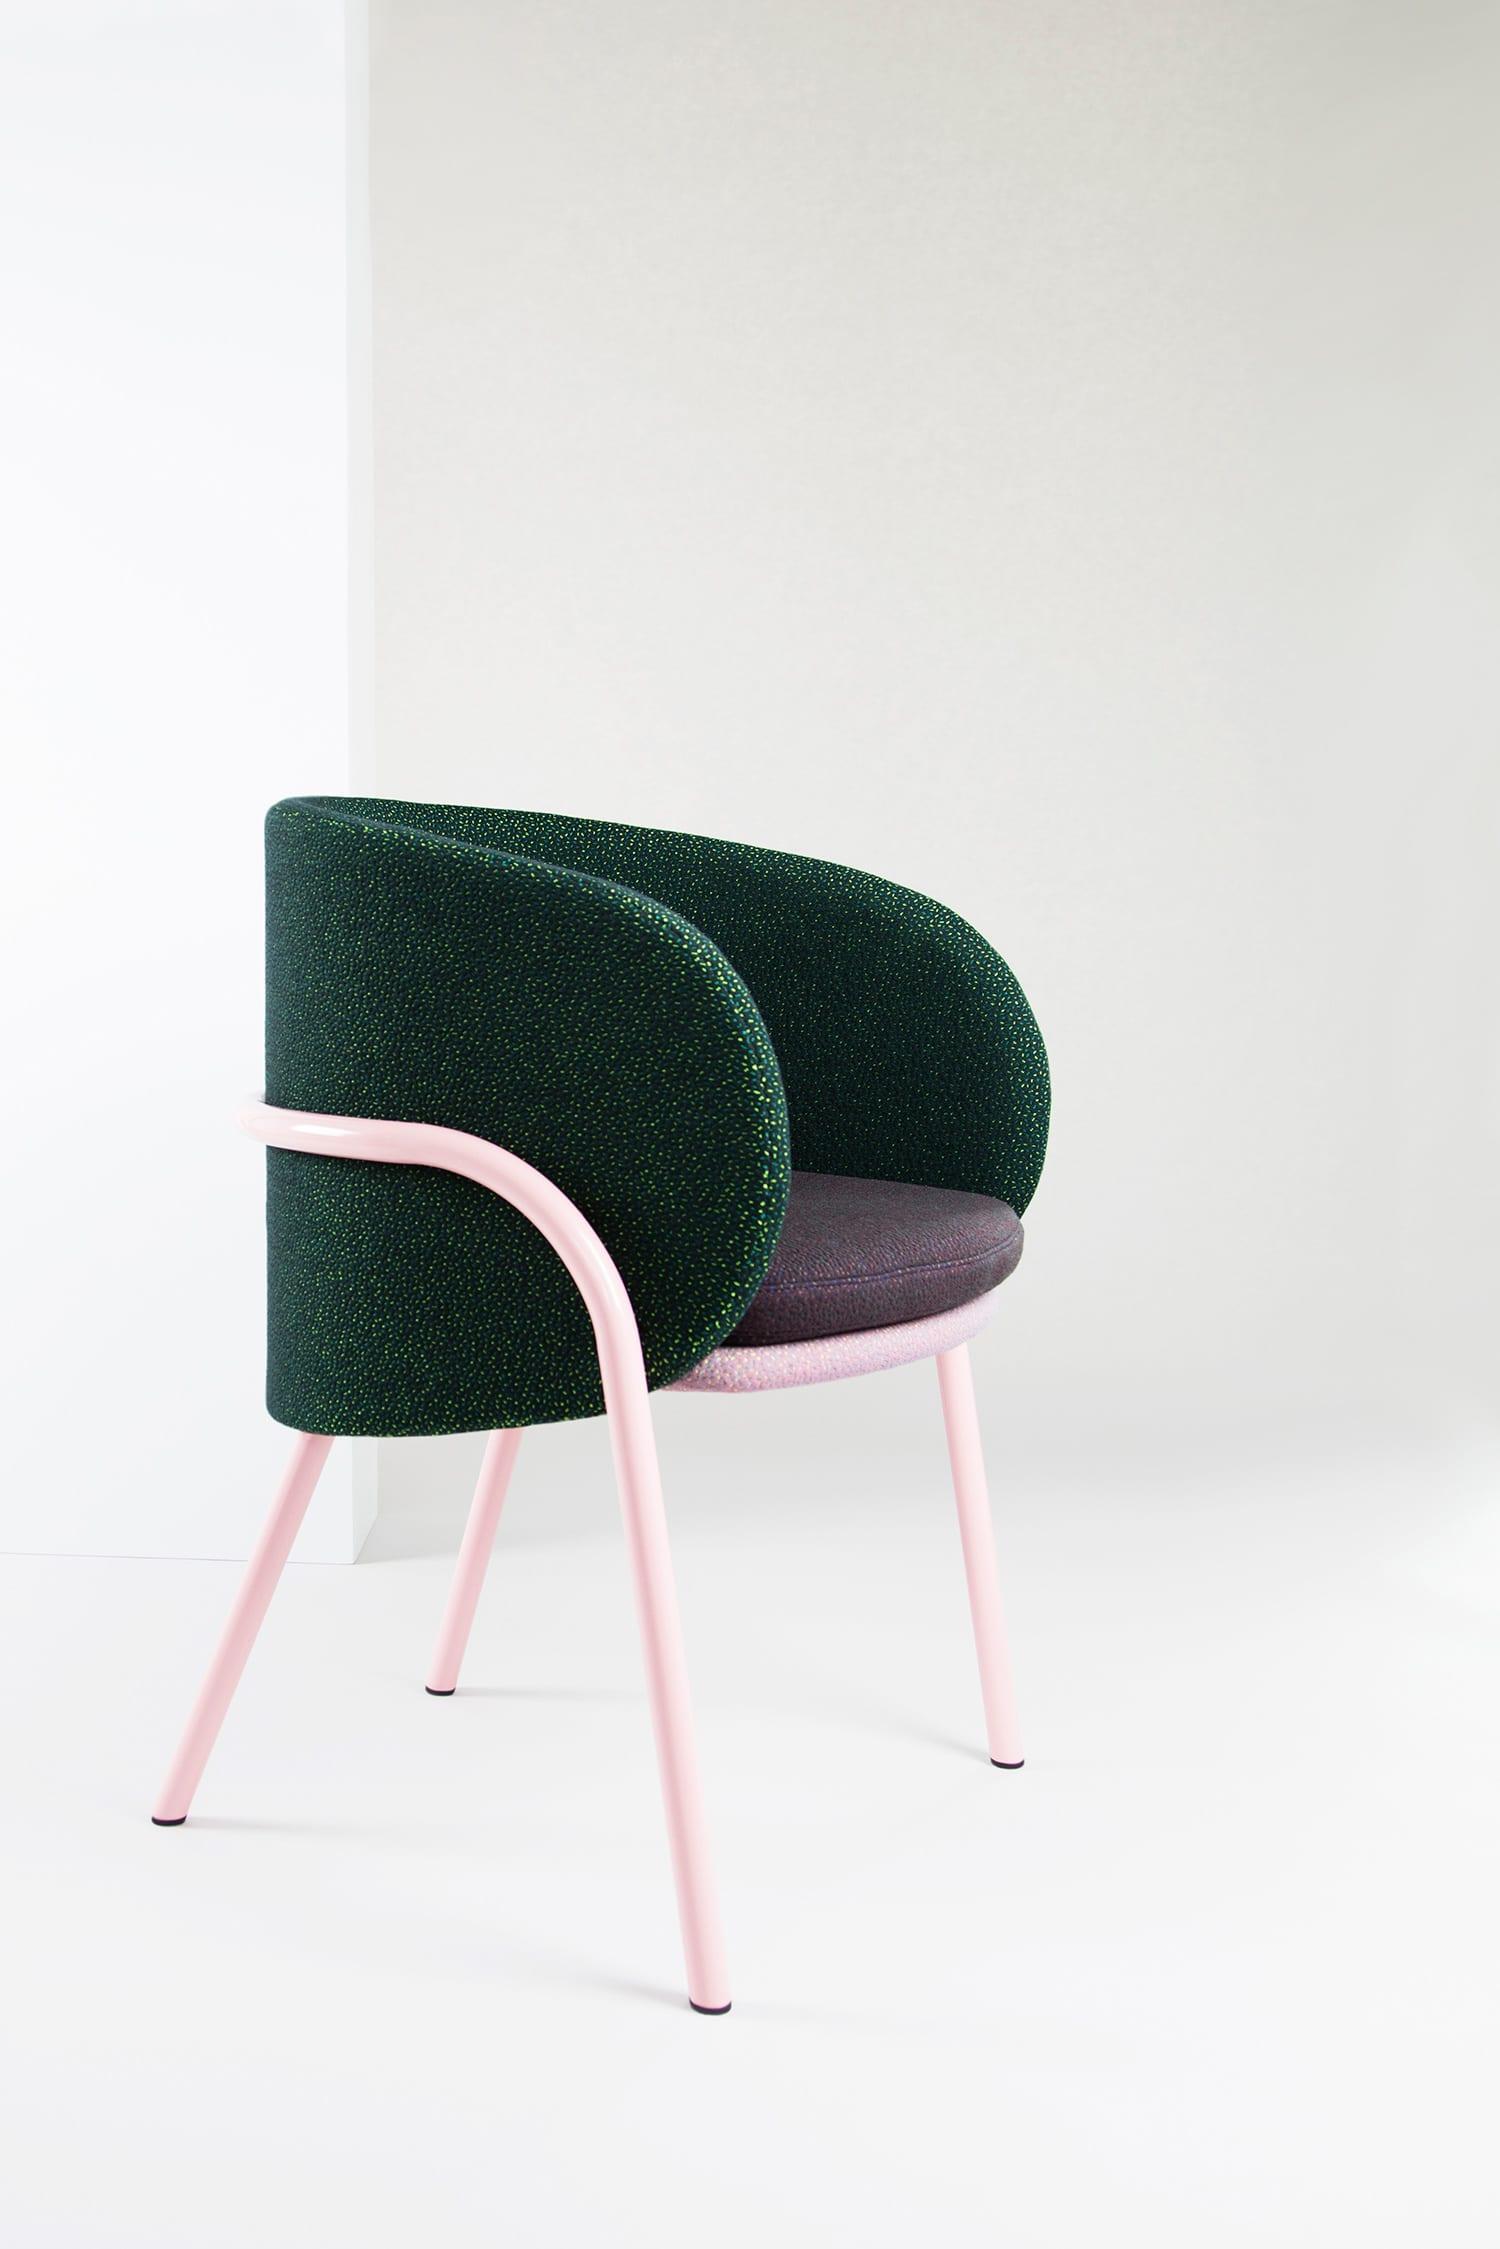 Wompoo chair by Nikolai Kotlarczy at Stockholm Furniture Fair 2018   Yellowtrace